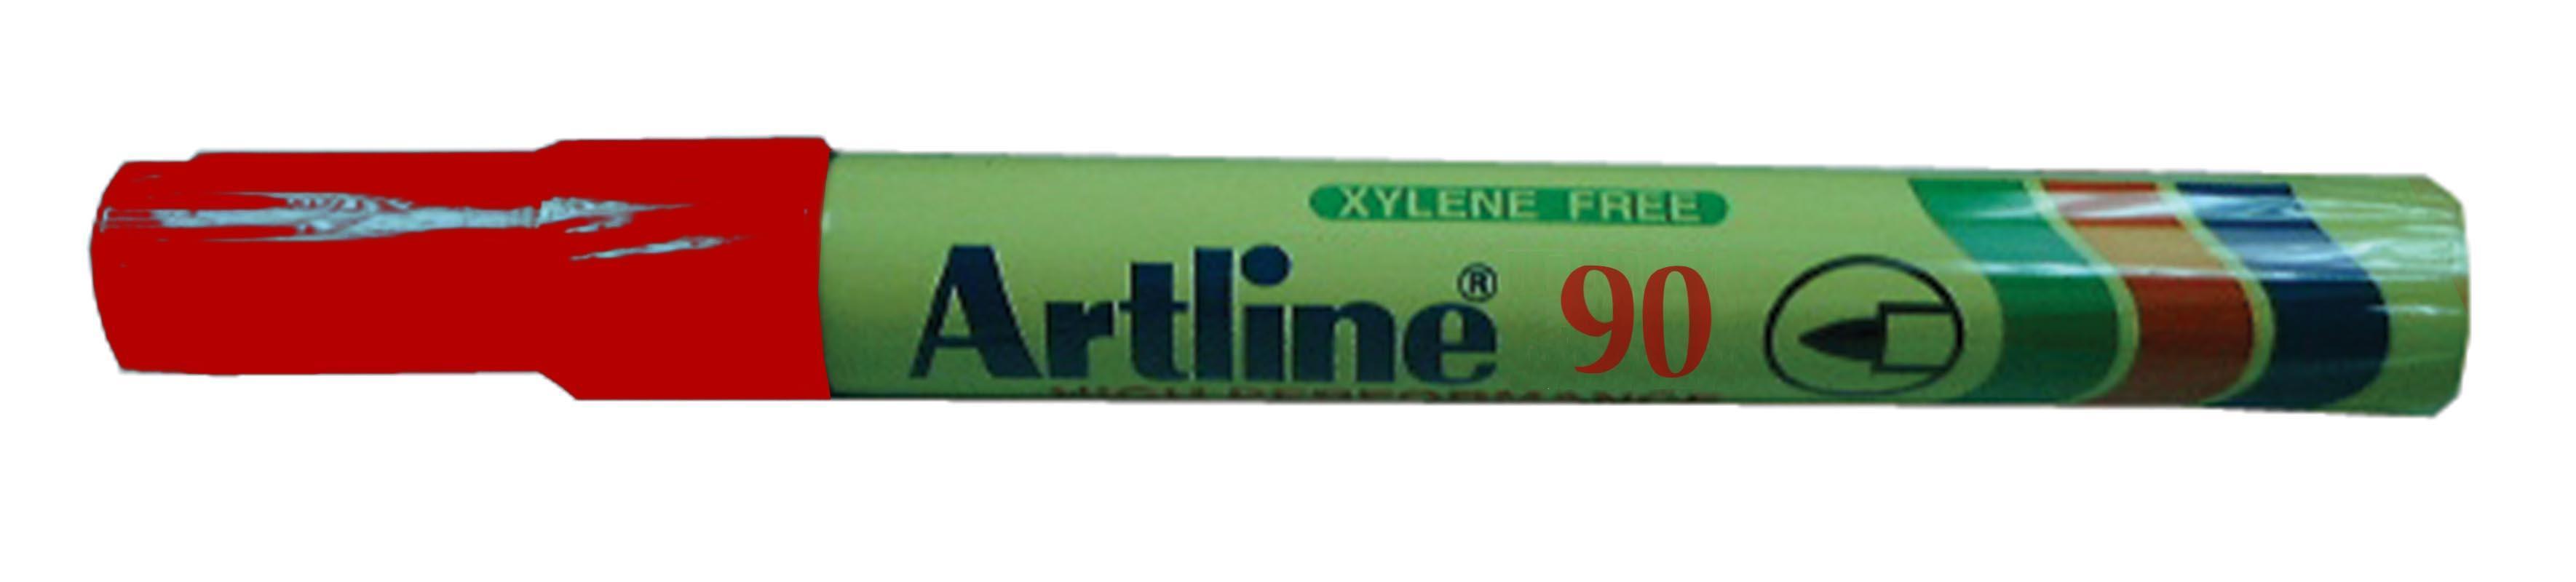 Next Artline ΕΚ90 μαρκαδόρος ανεξίτηλος κόκκινος 12206-0271-2